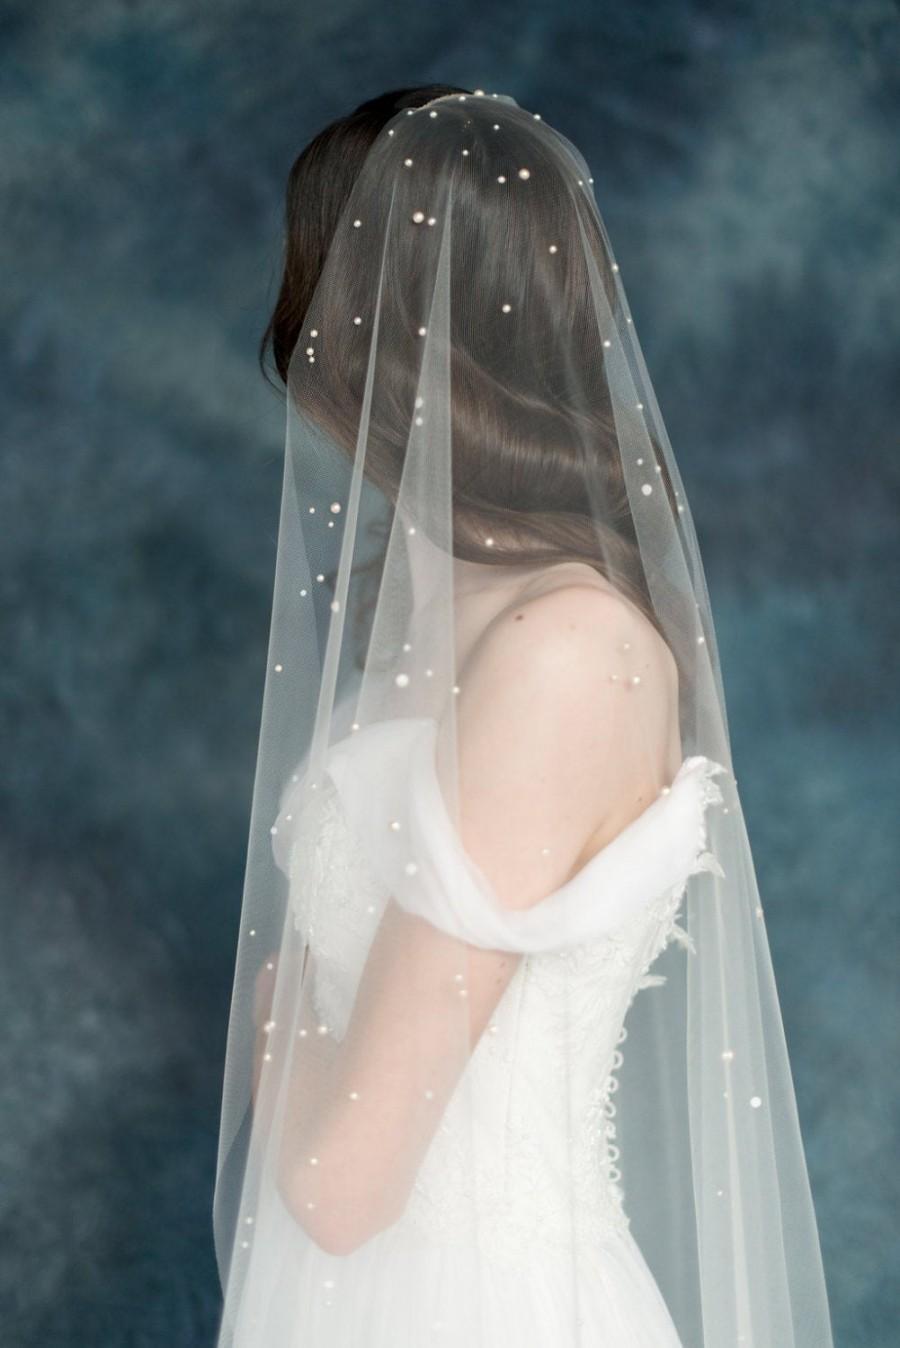 Свадьба - Pearl Wedding Veil, Ivory Bridal Veil, Polka Dot Veil, TulleVeil, Scattered Pearl Veil, Raw Cut Veil, Modern Veil, Single Tier Veil, AMANIE